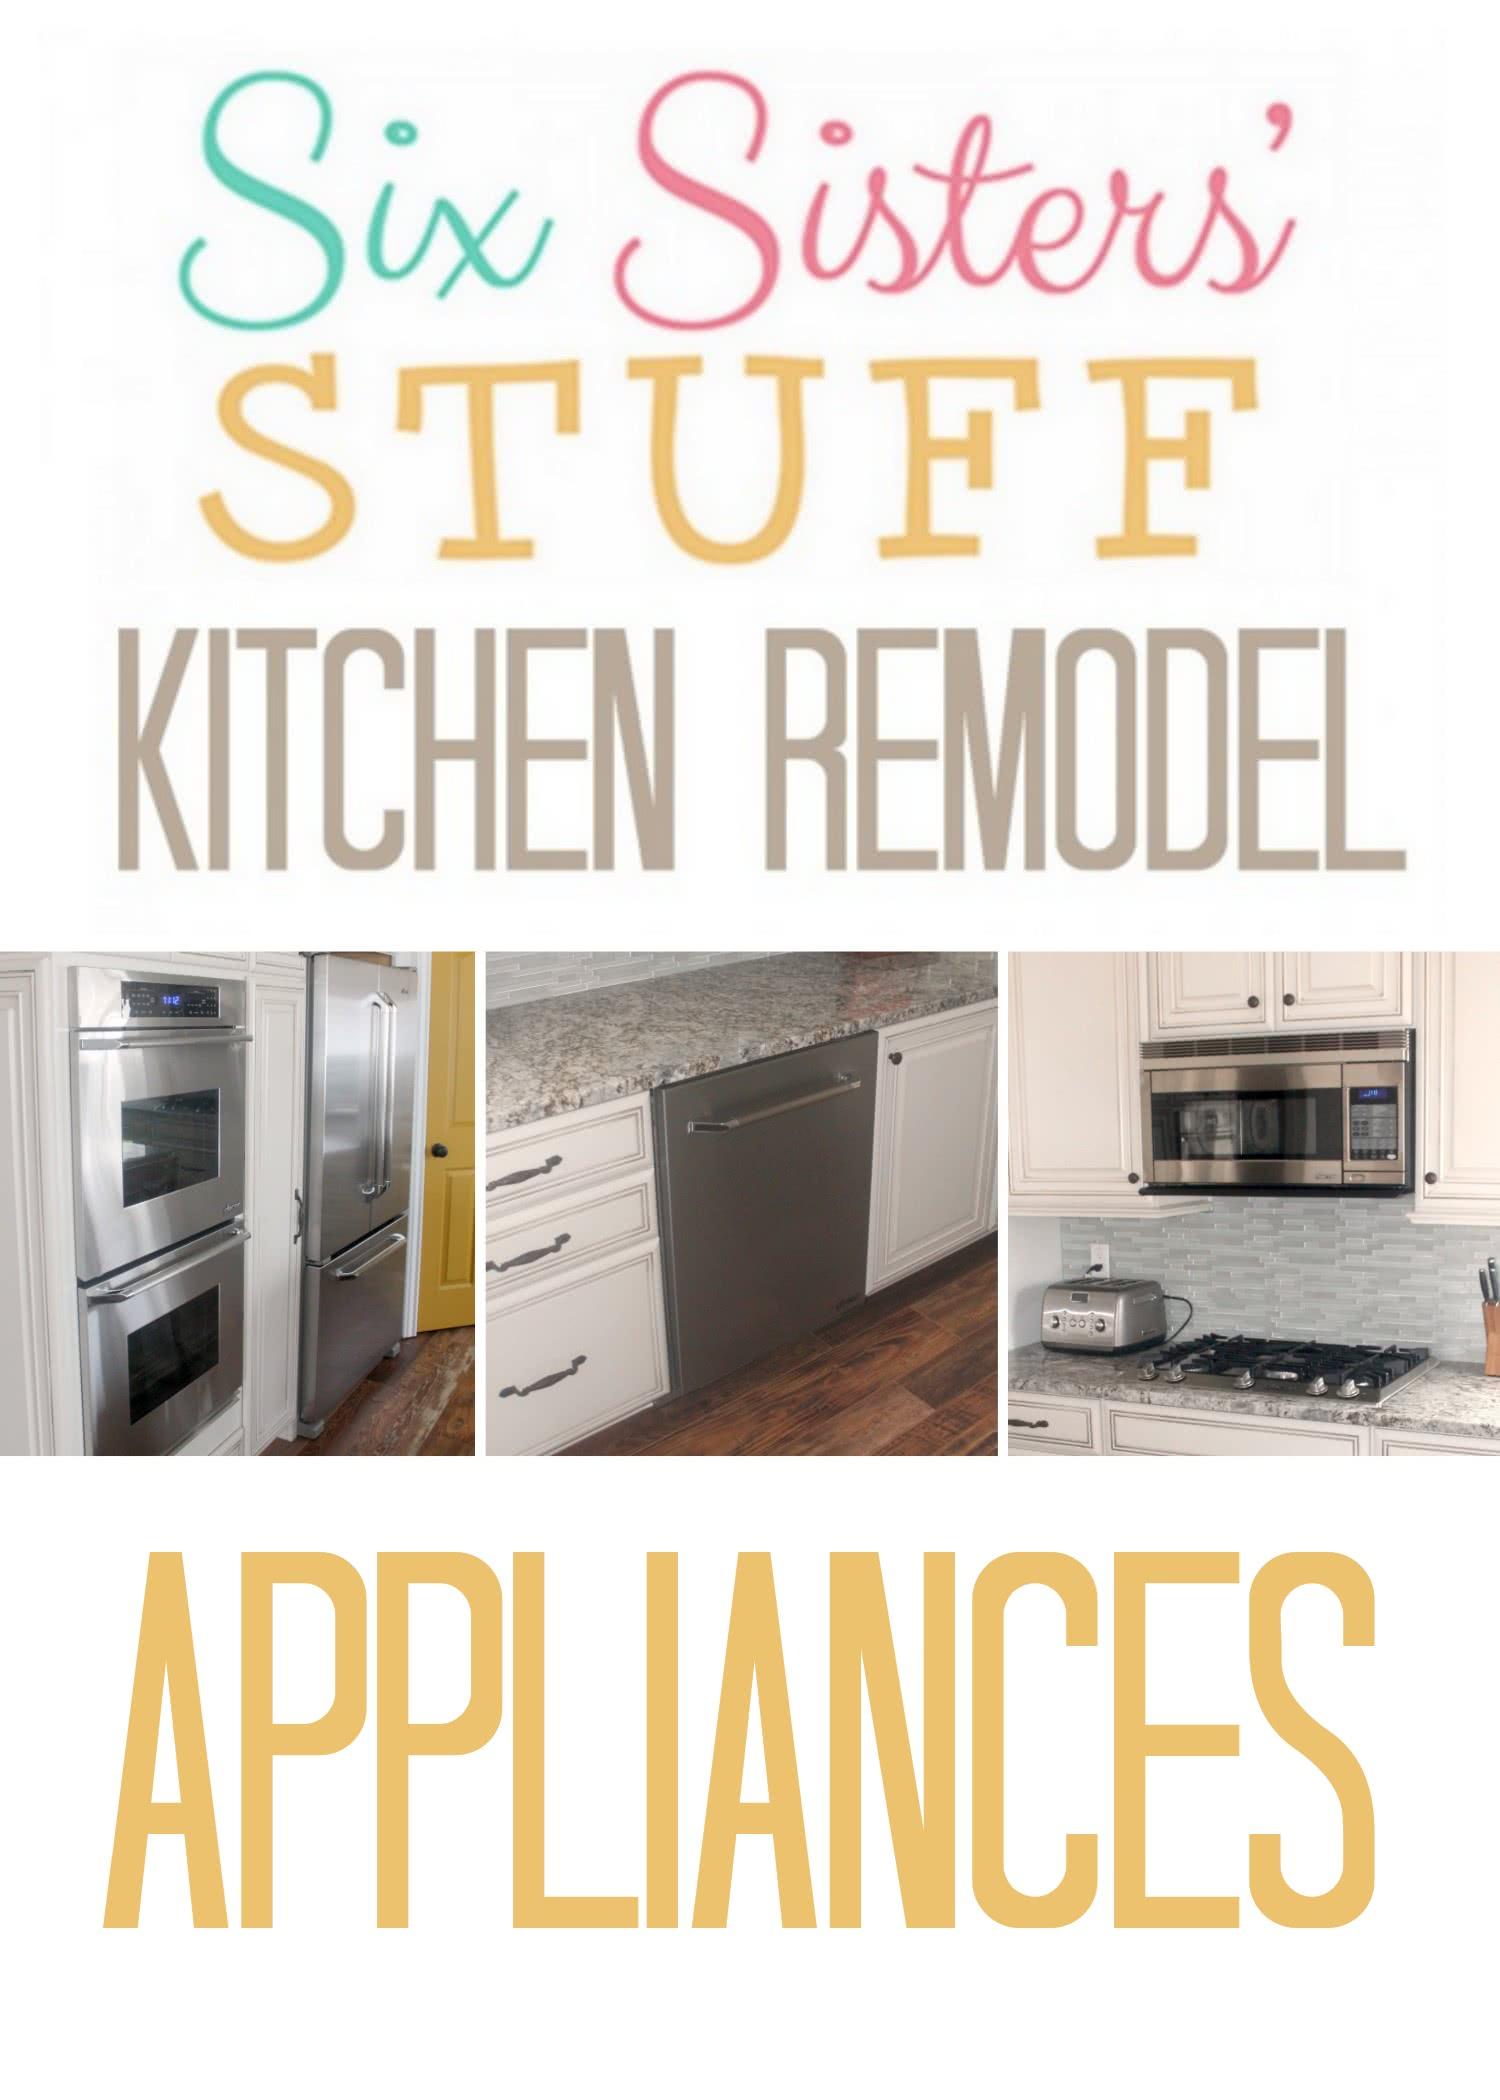 six-sisters-stuff-kitchen-remodel-appliances.jpg